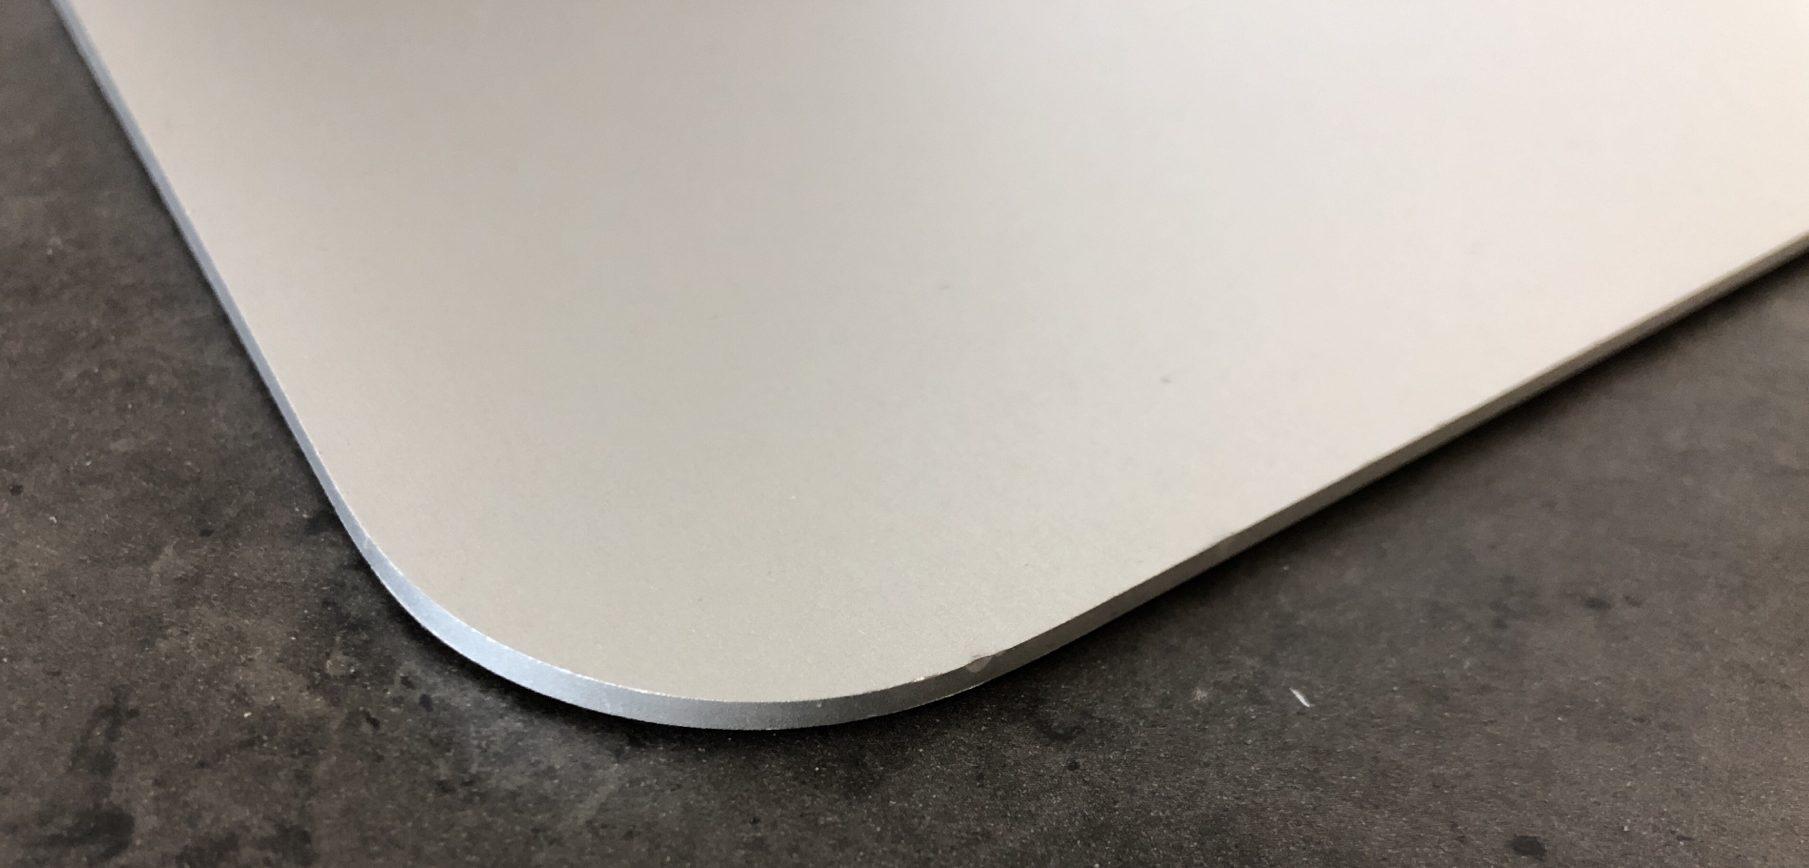 "iMac 27"" Retina 5K Late 2015 (Intel Quad-Core i7 4.0 GHz 32 GB RAM 1 TB Fusion Drive), Intel Quad-Core i7 4.0 GHz, 32 GB RAM, 1 TB Fusion Drive, Afbeelding 3"